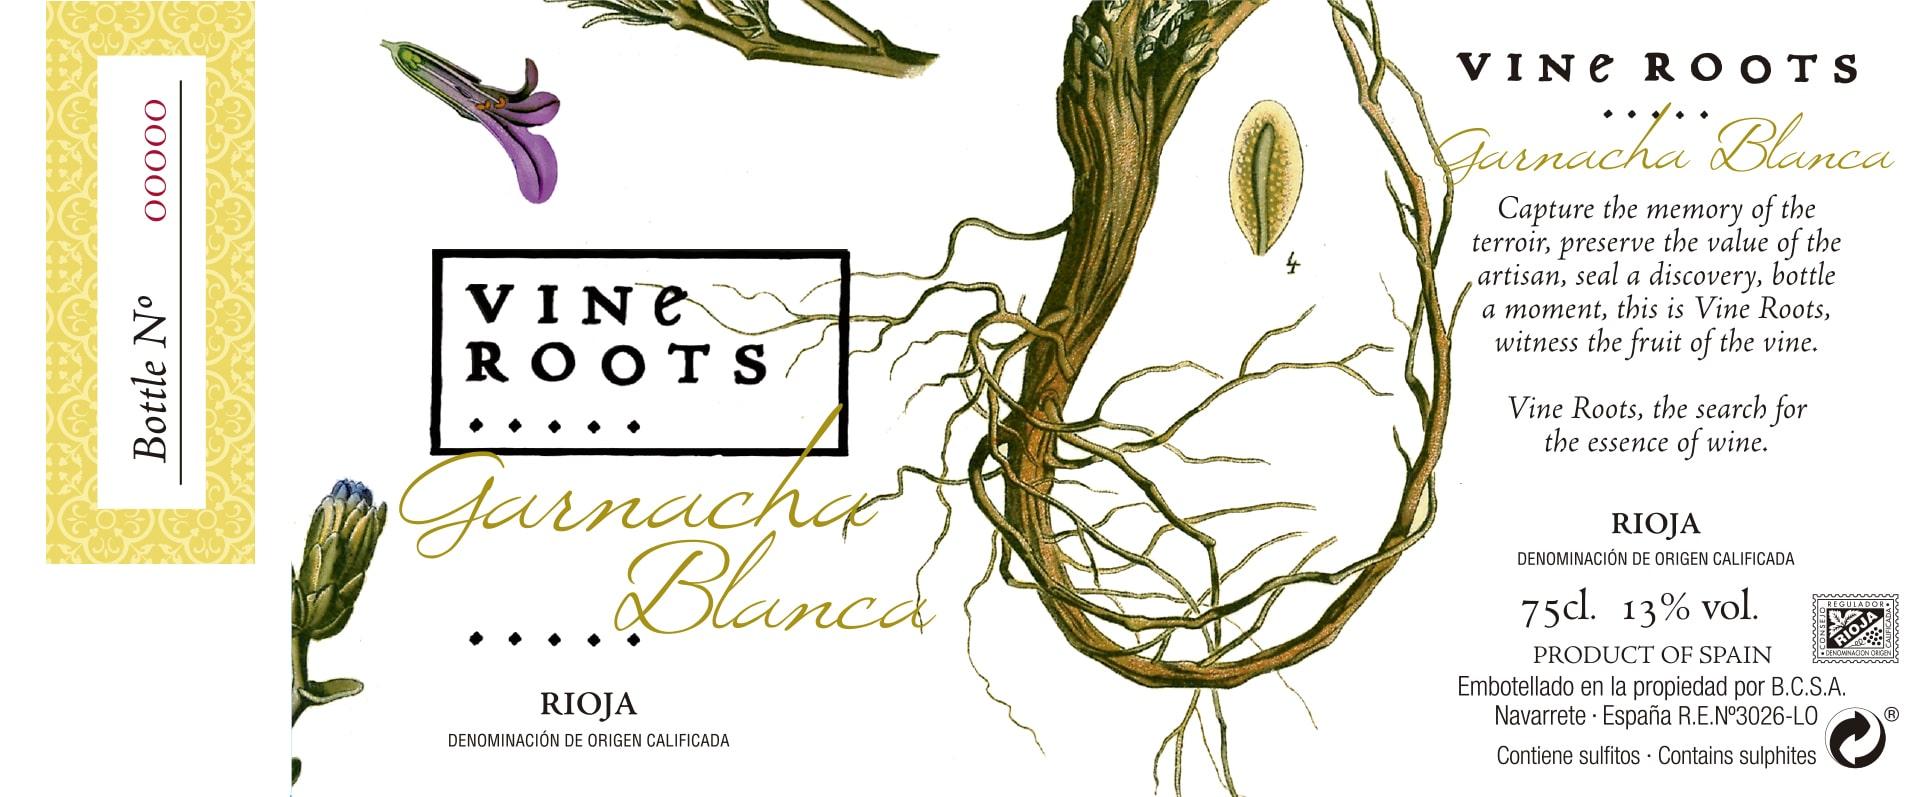 Vine Roots Garnacha Blanca Ecológico